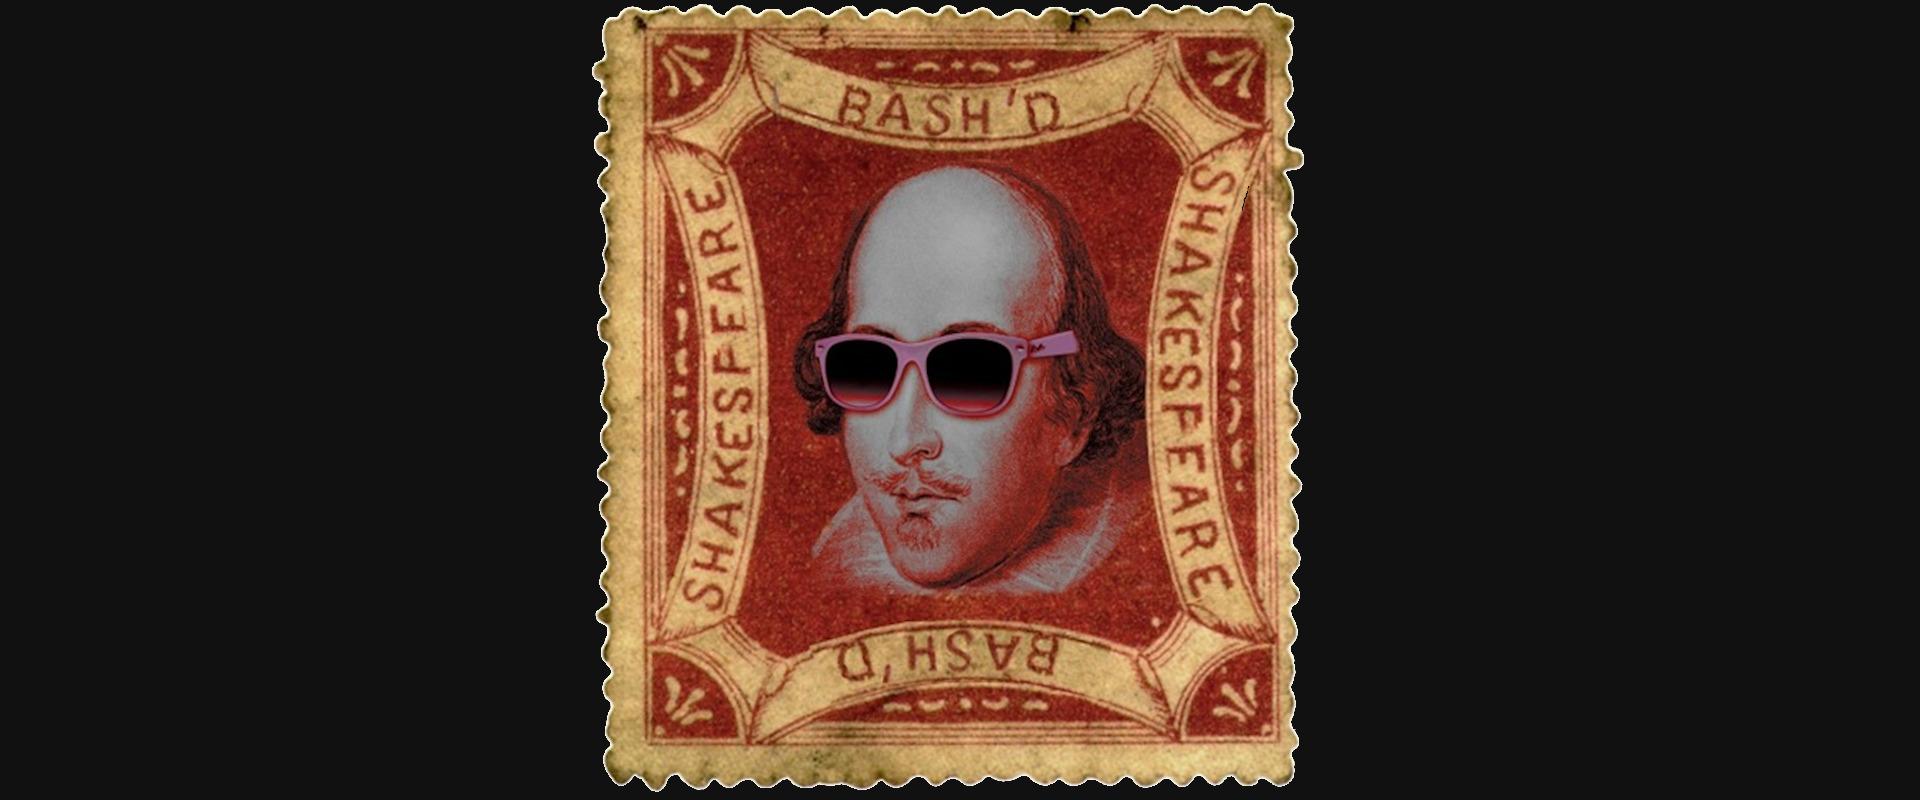 Shakespeare BASH'd